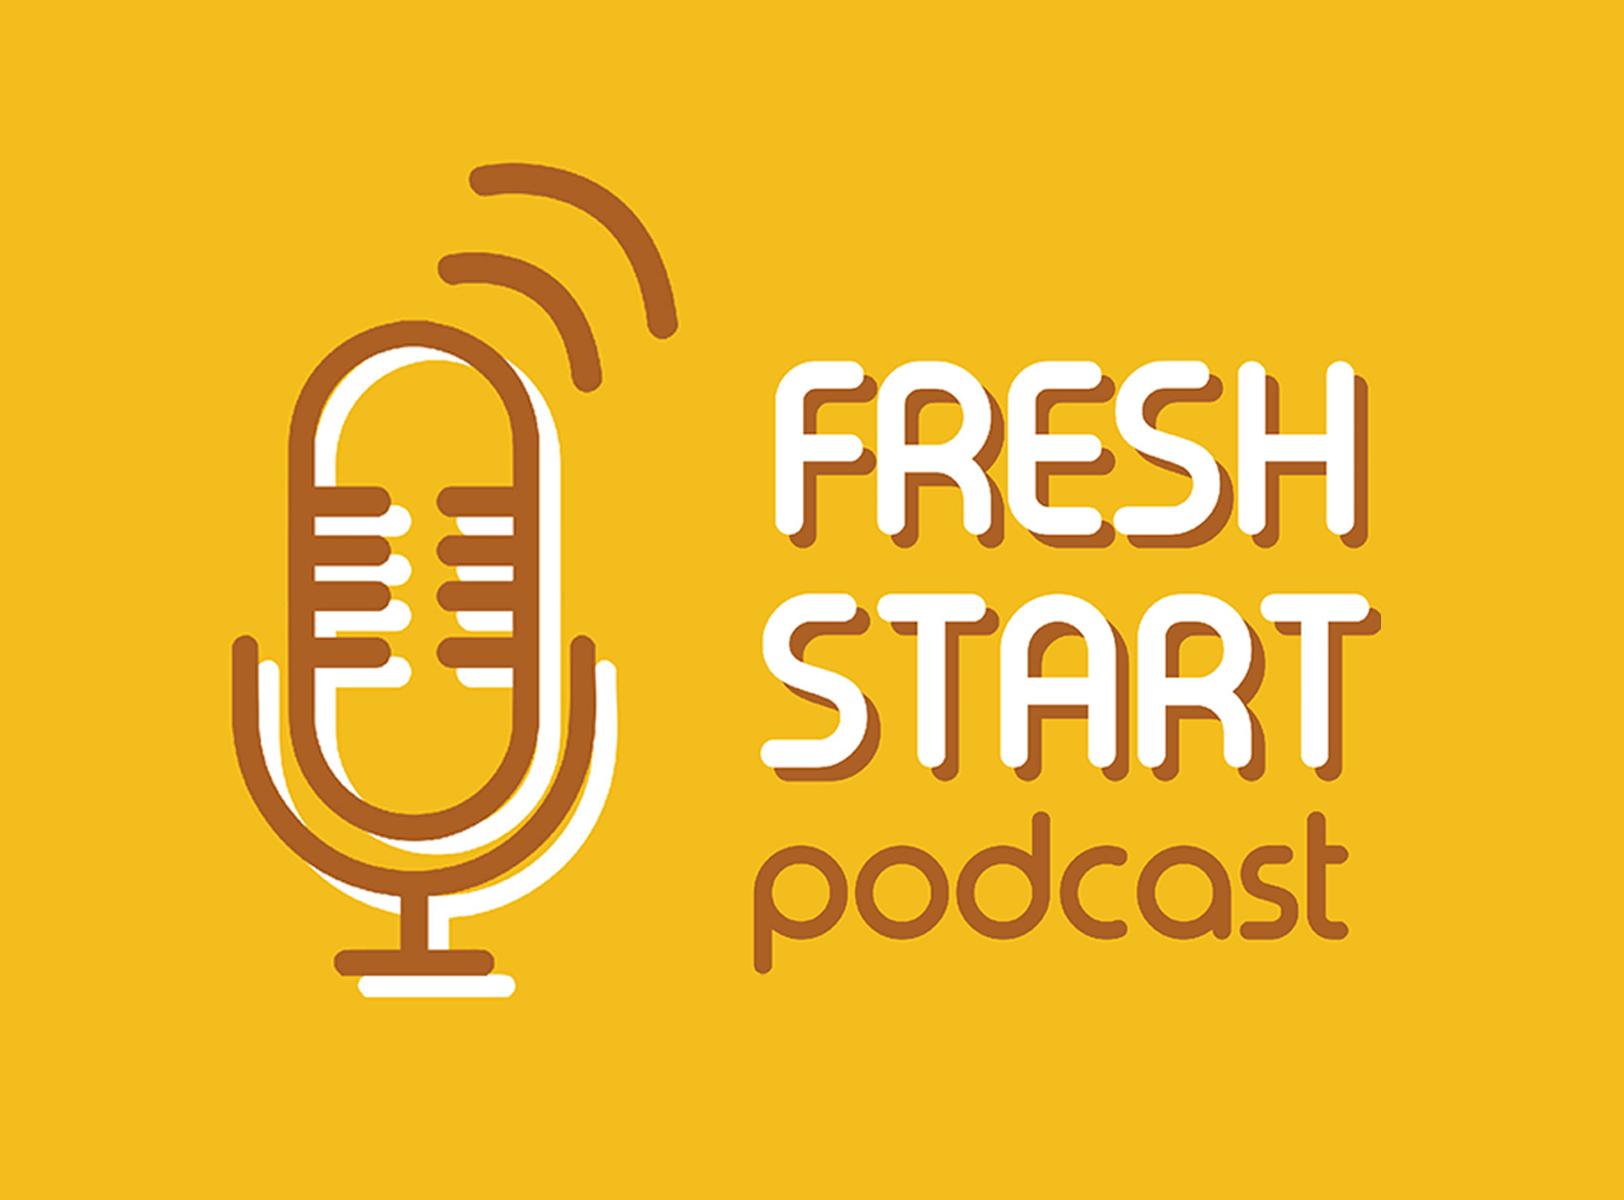 Fresh Start: Podcast News (4/14/2020 Tue.)